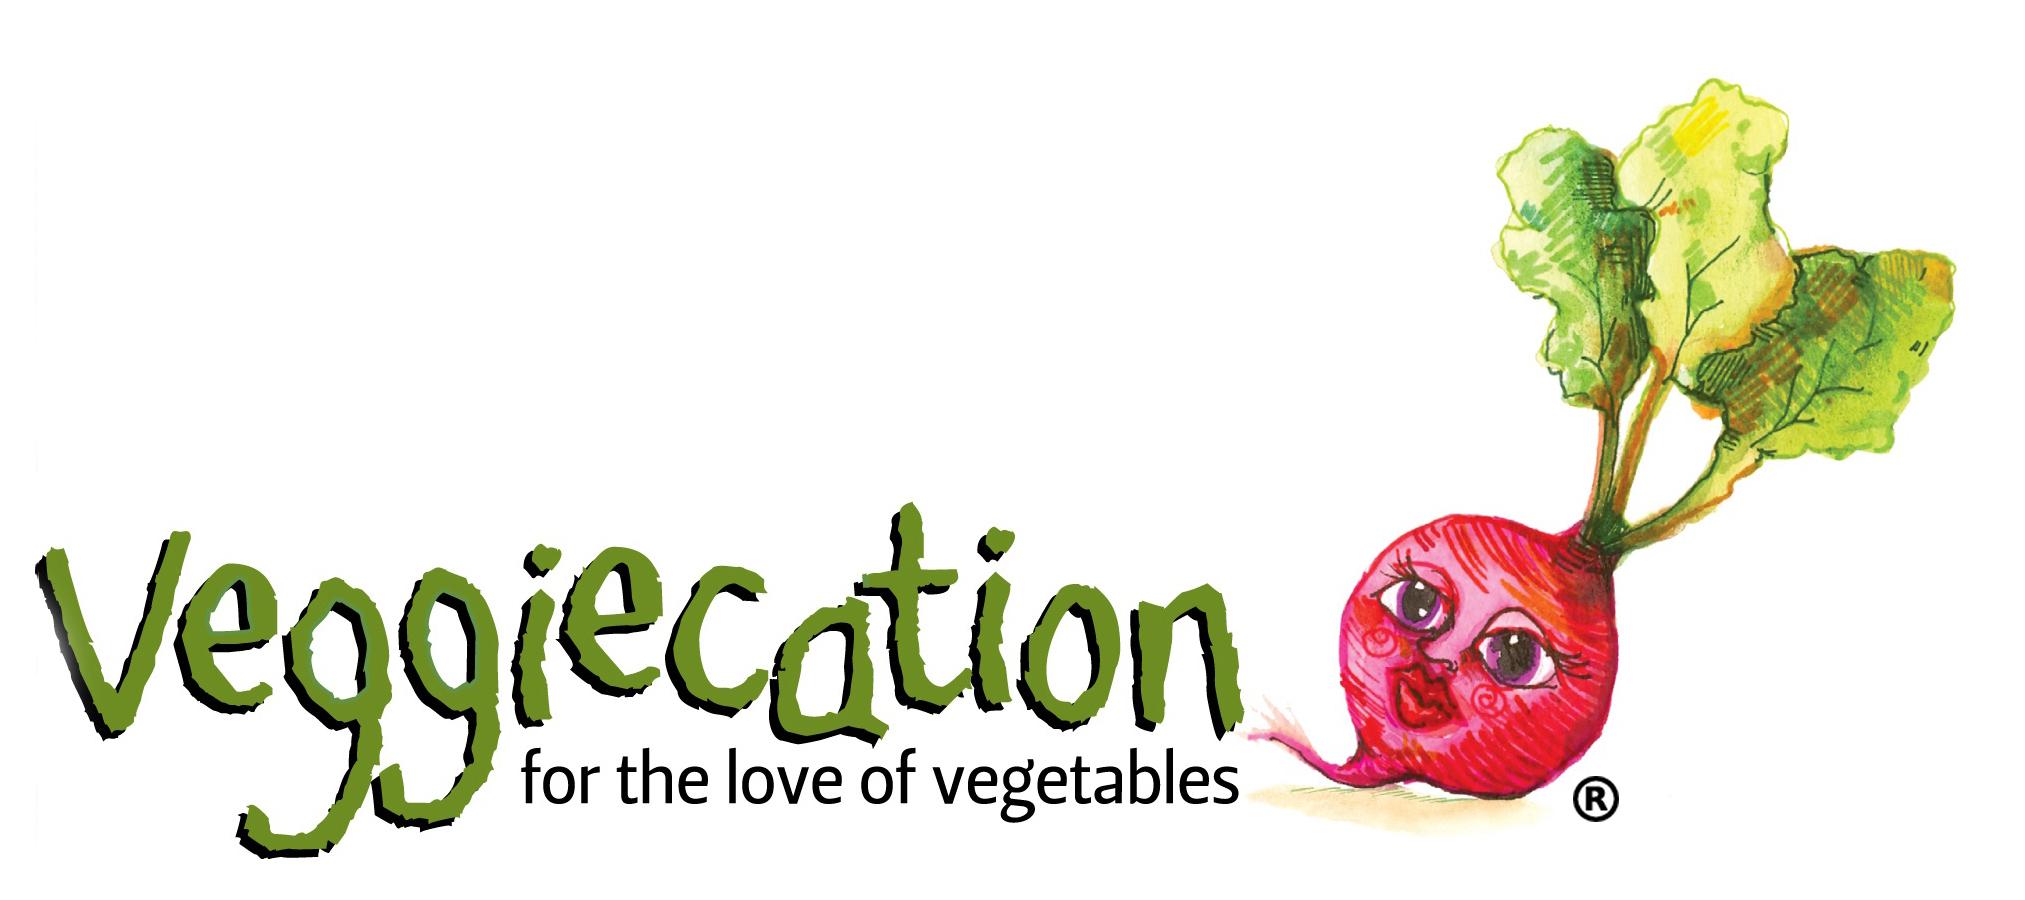 Veggiecation – Lisa Suriano